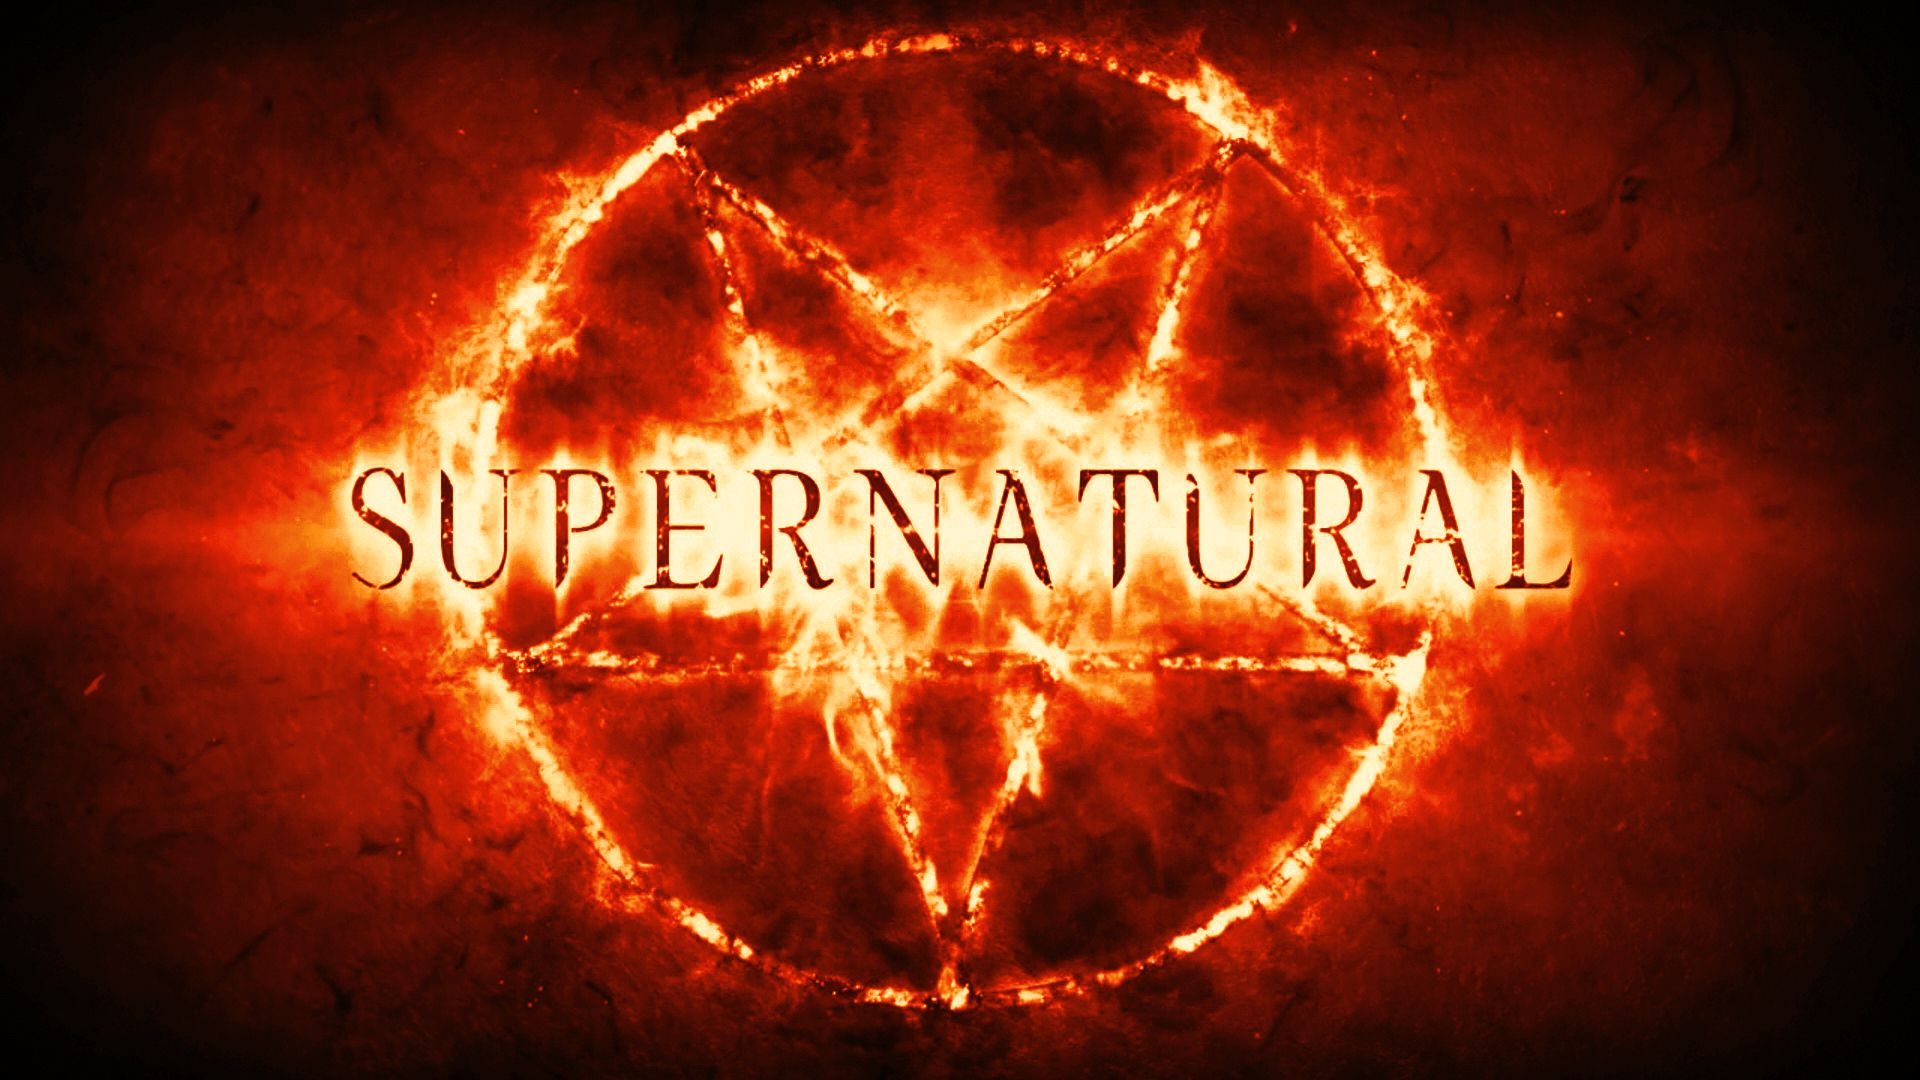 supernatural anti possession wallpaper Google Search